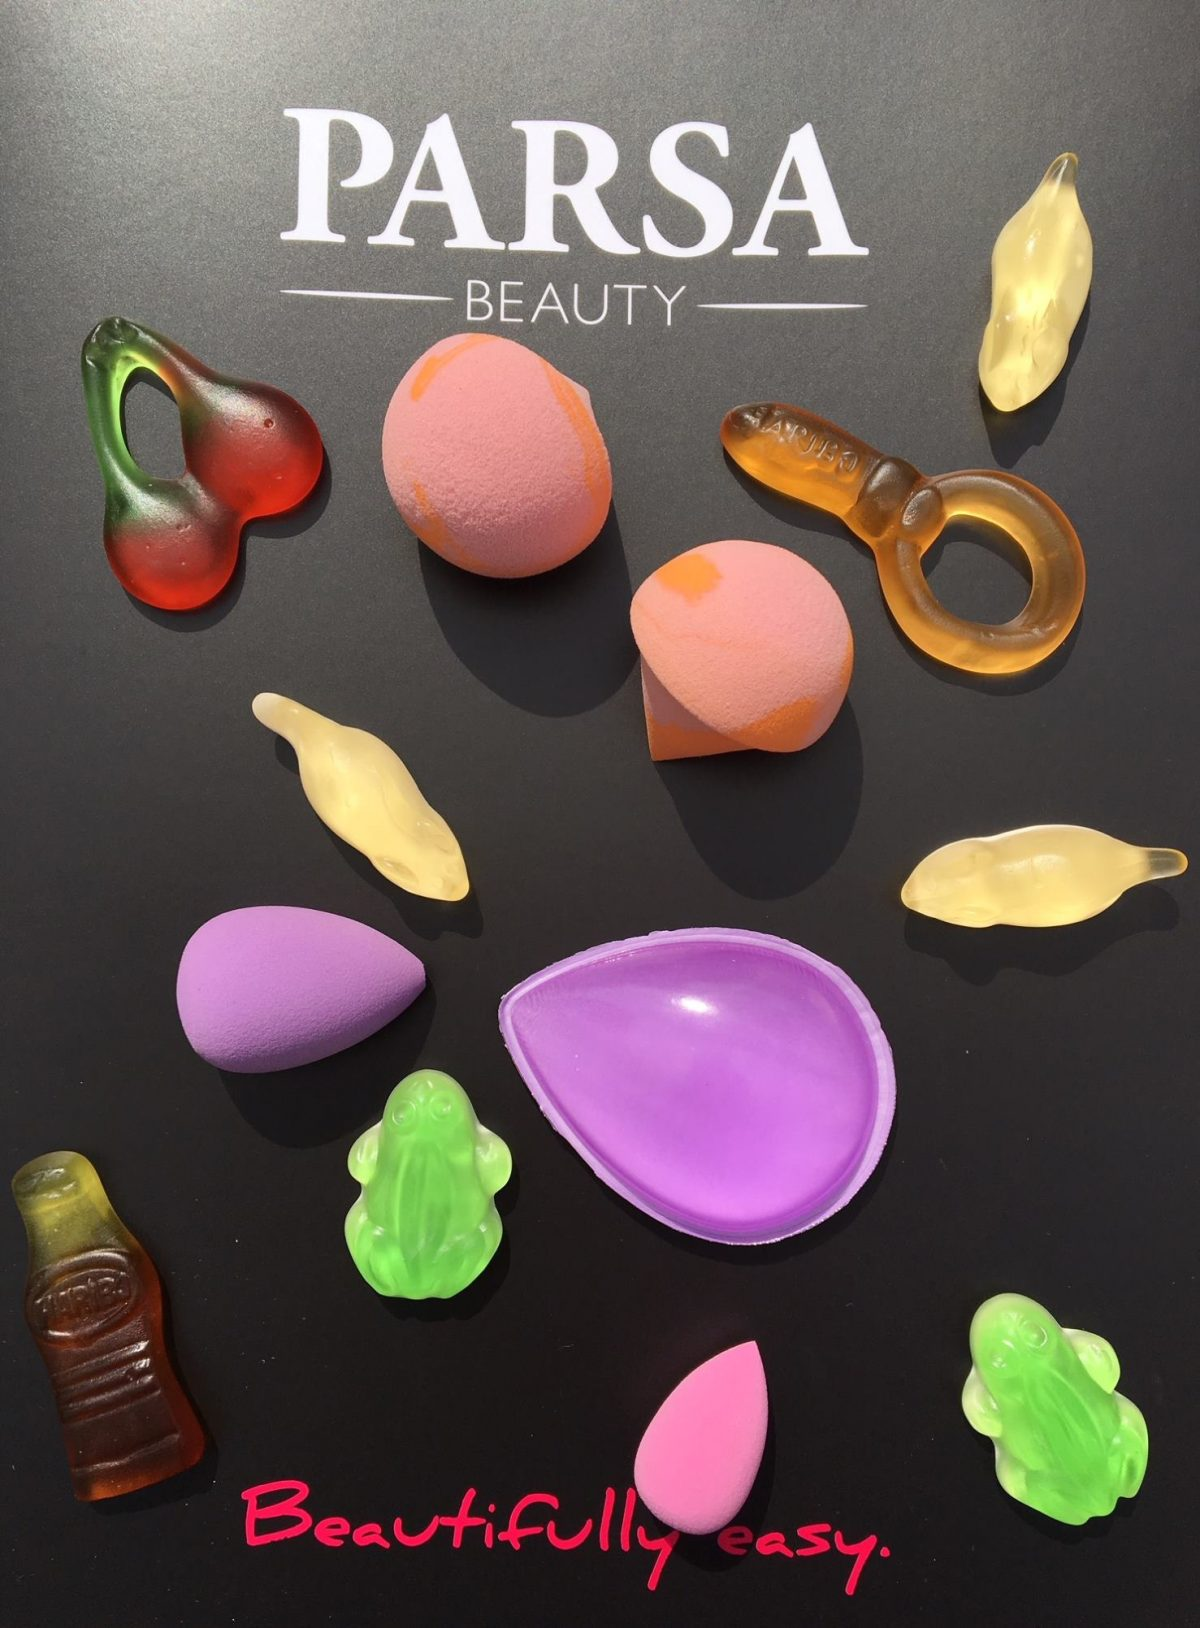 parsa beauty tools